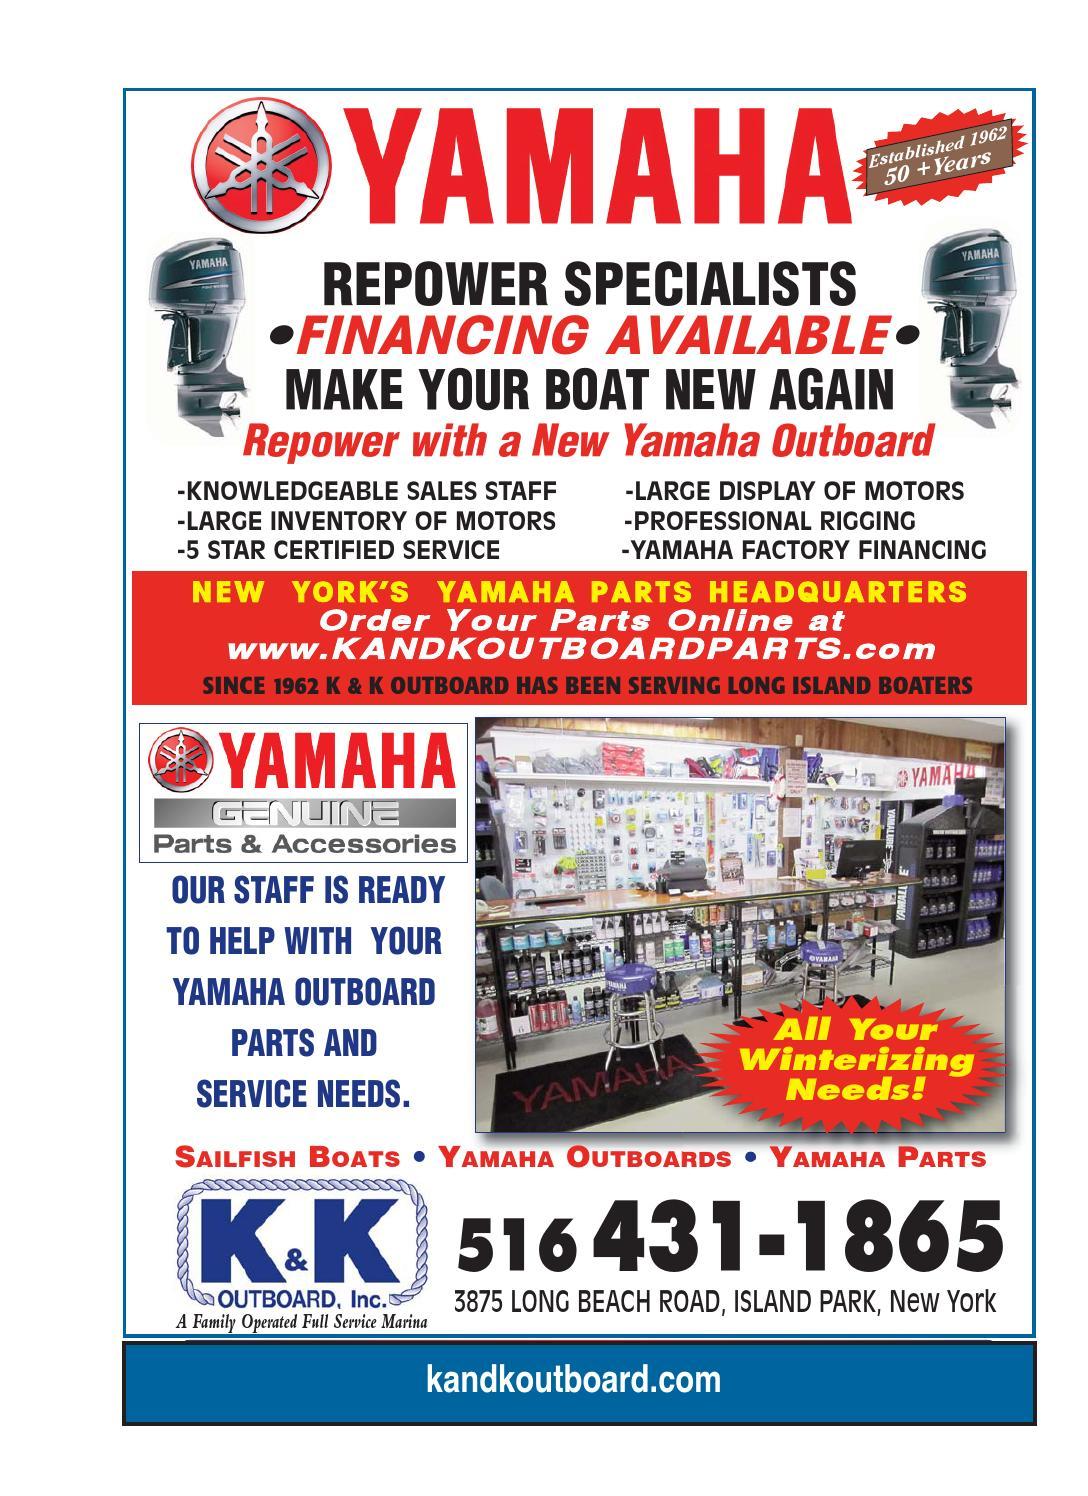 Issuu Boats4sale 09 12 14 By Boats4sale Com Media Issuu